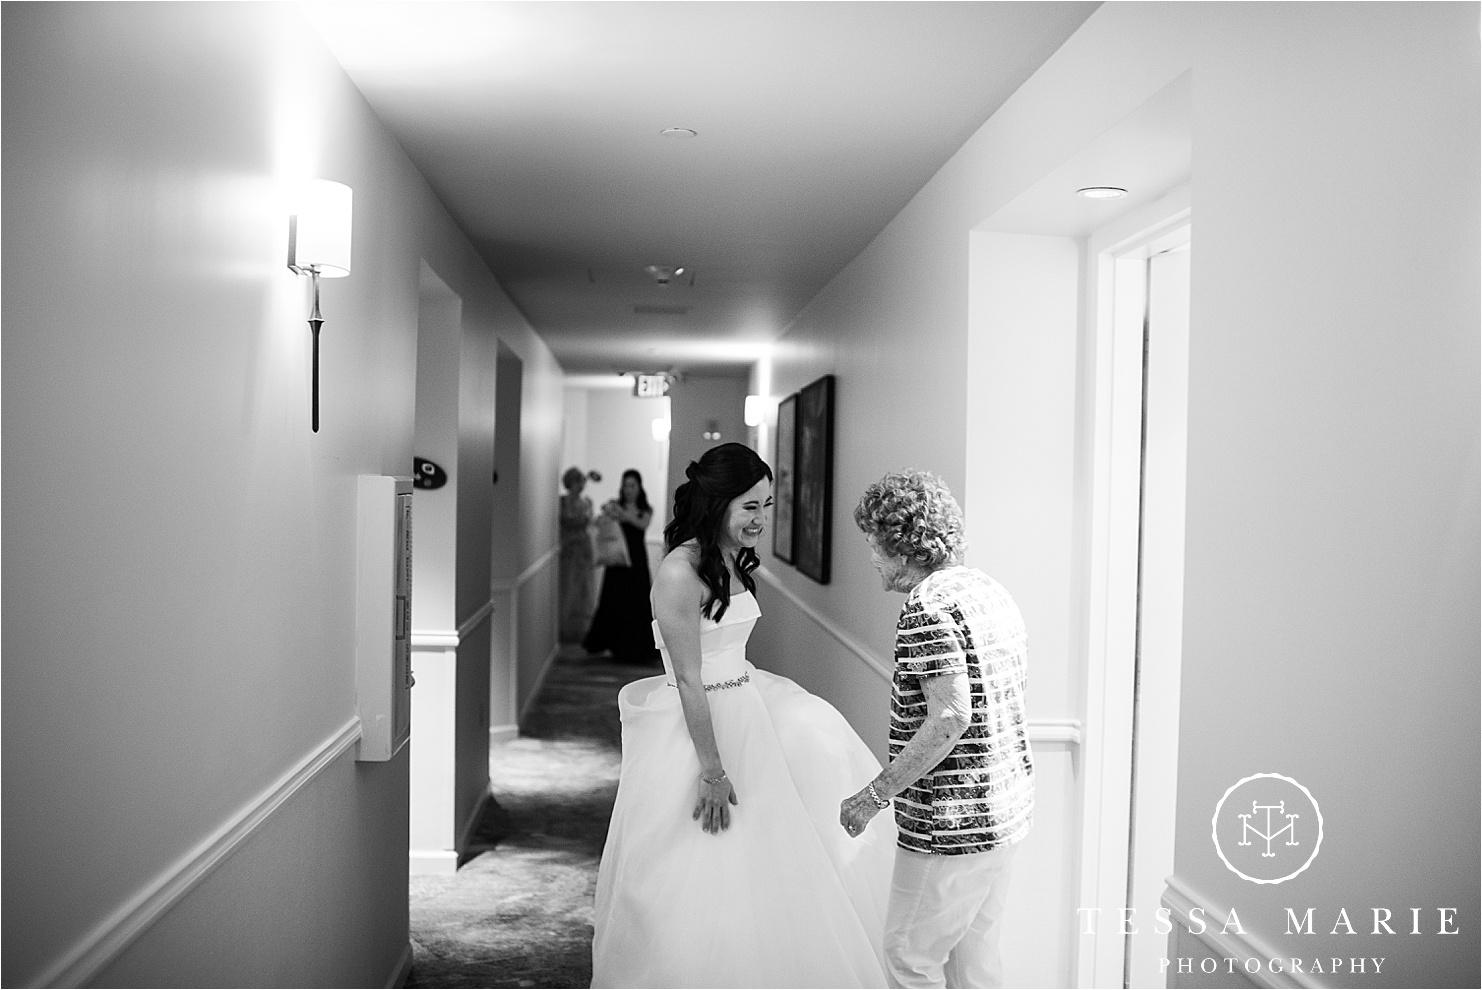 Tessa_marie_weddings_houston_wedding_photographer_The_astorian_0028.jpg